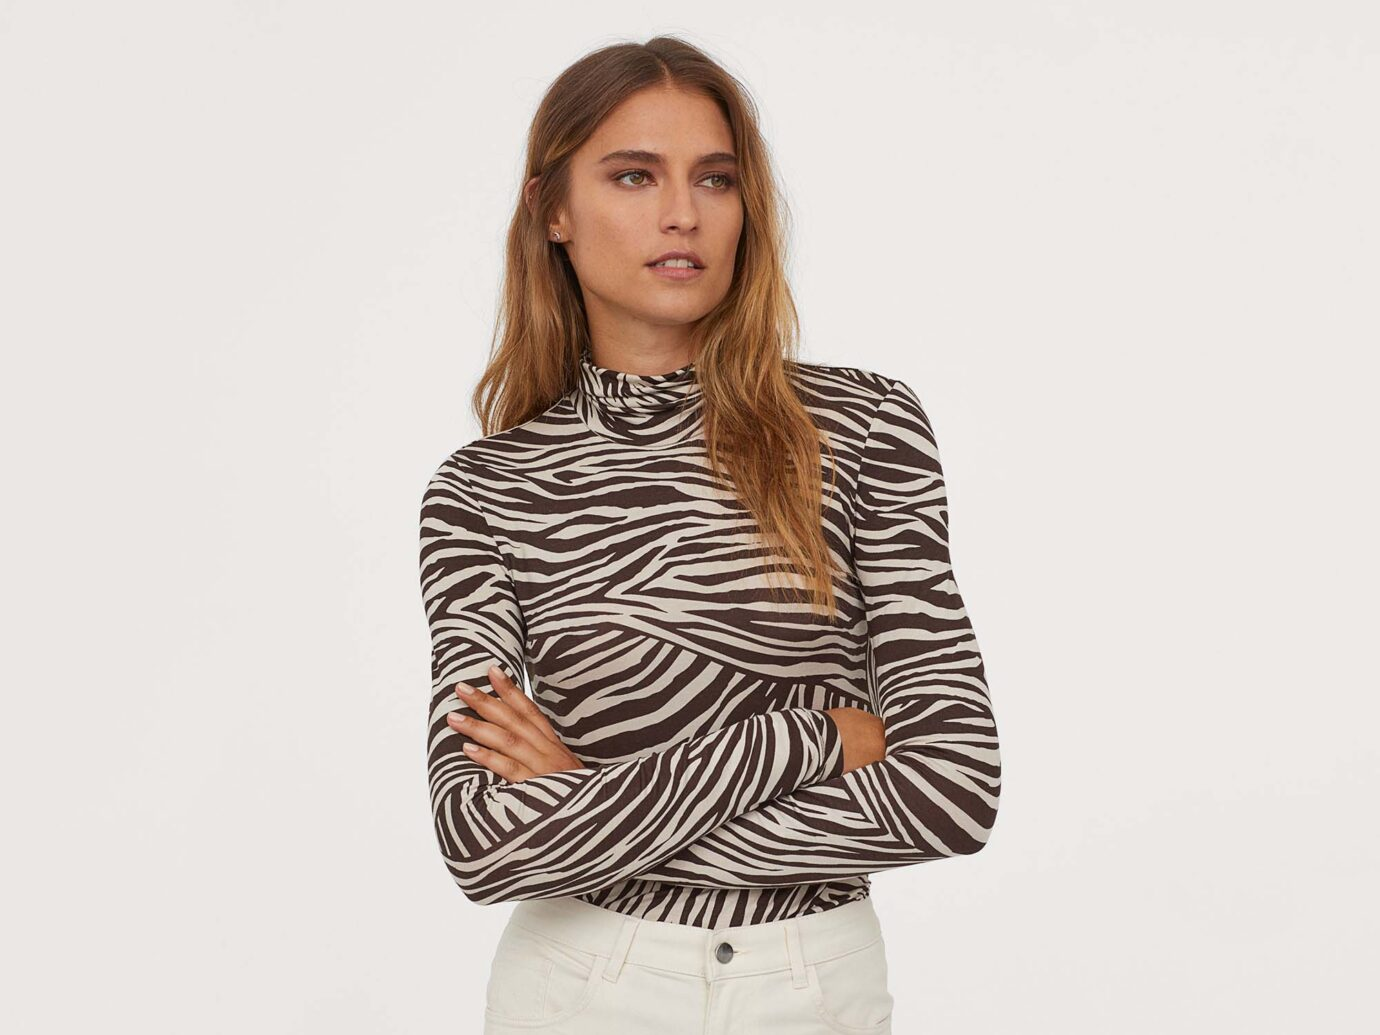 H&M Modal Turtleneck Top